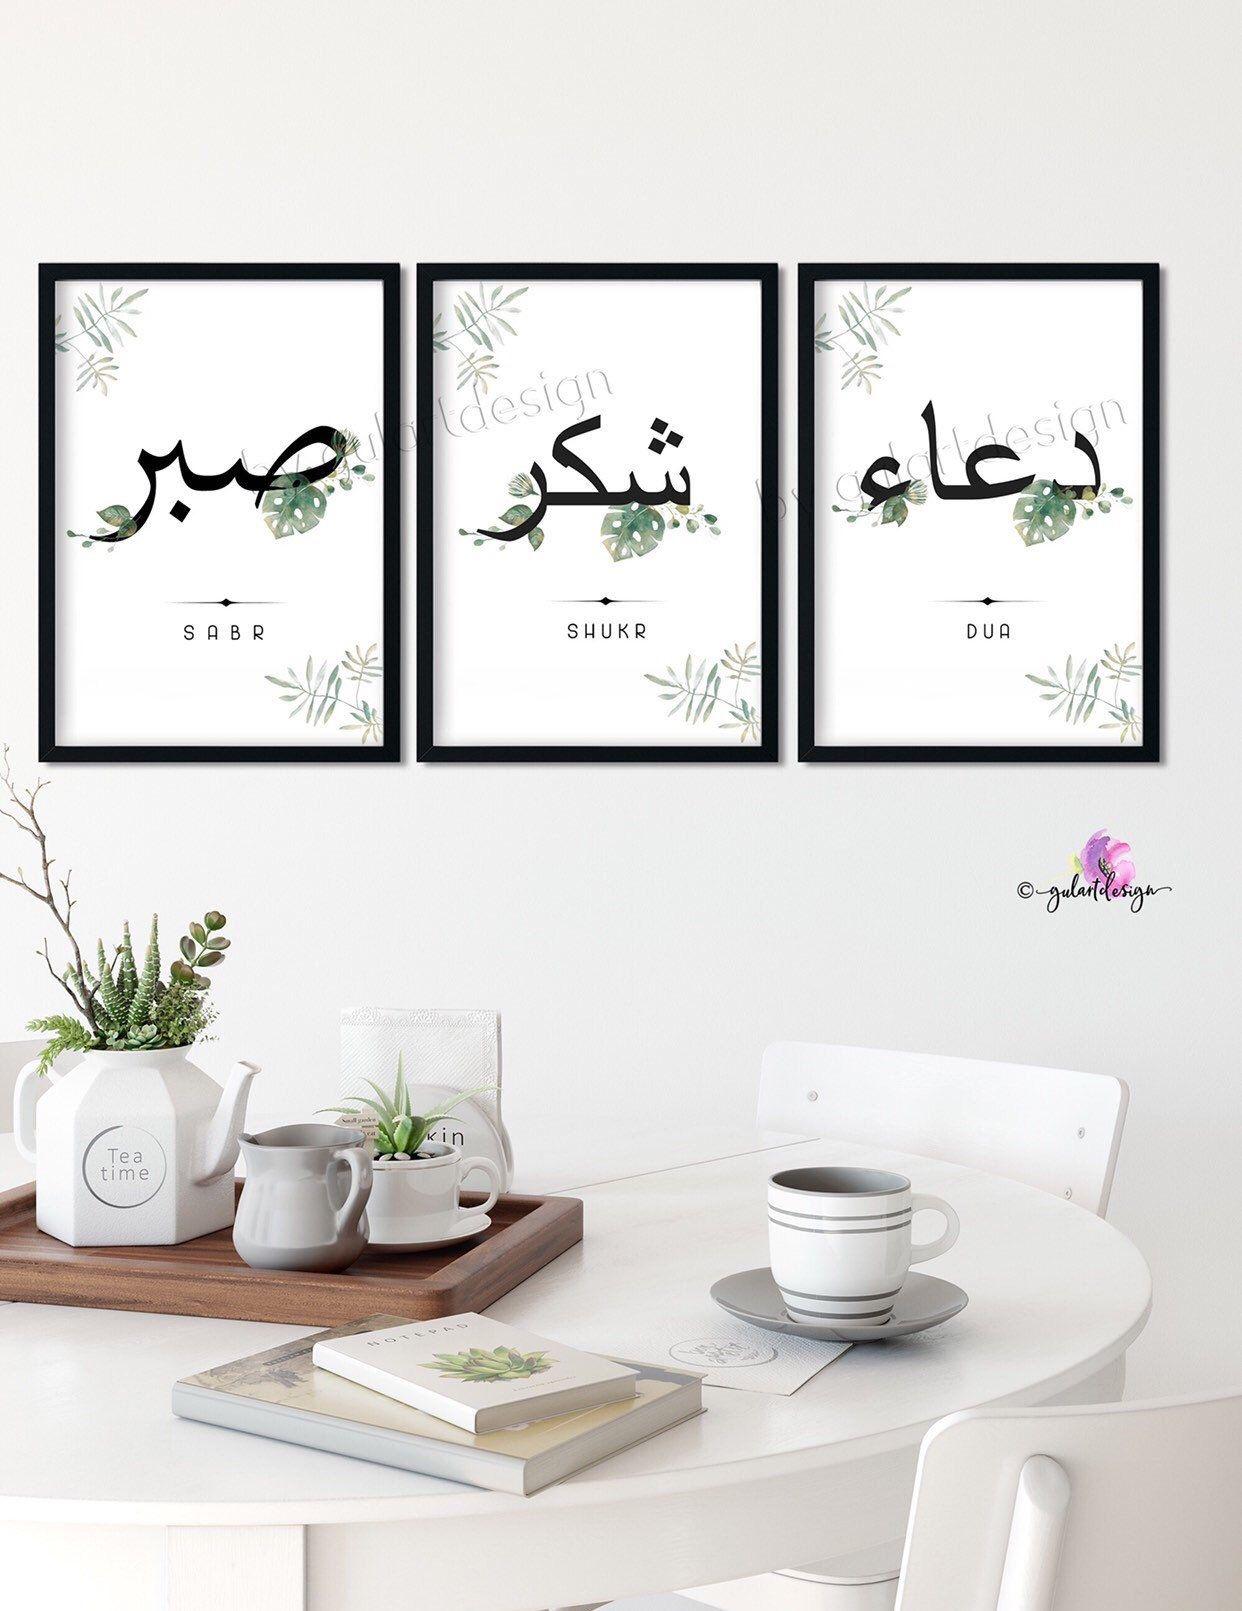 Freue mich, euch diesen Artikel aus meinem Shop bei #etsy vorzustellen: Islamisches Set, Sabr, Shukr, Dua, Islam, dua, islamic decor, islamic wallart, islamicquotes, koran, quran, islamicposter, Eidgiftideas